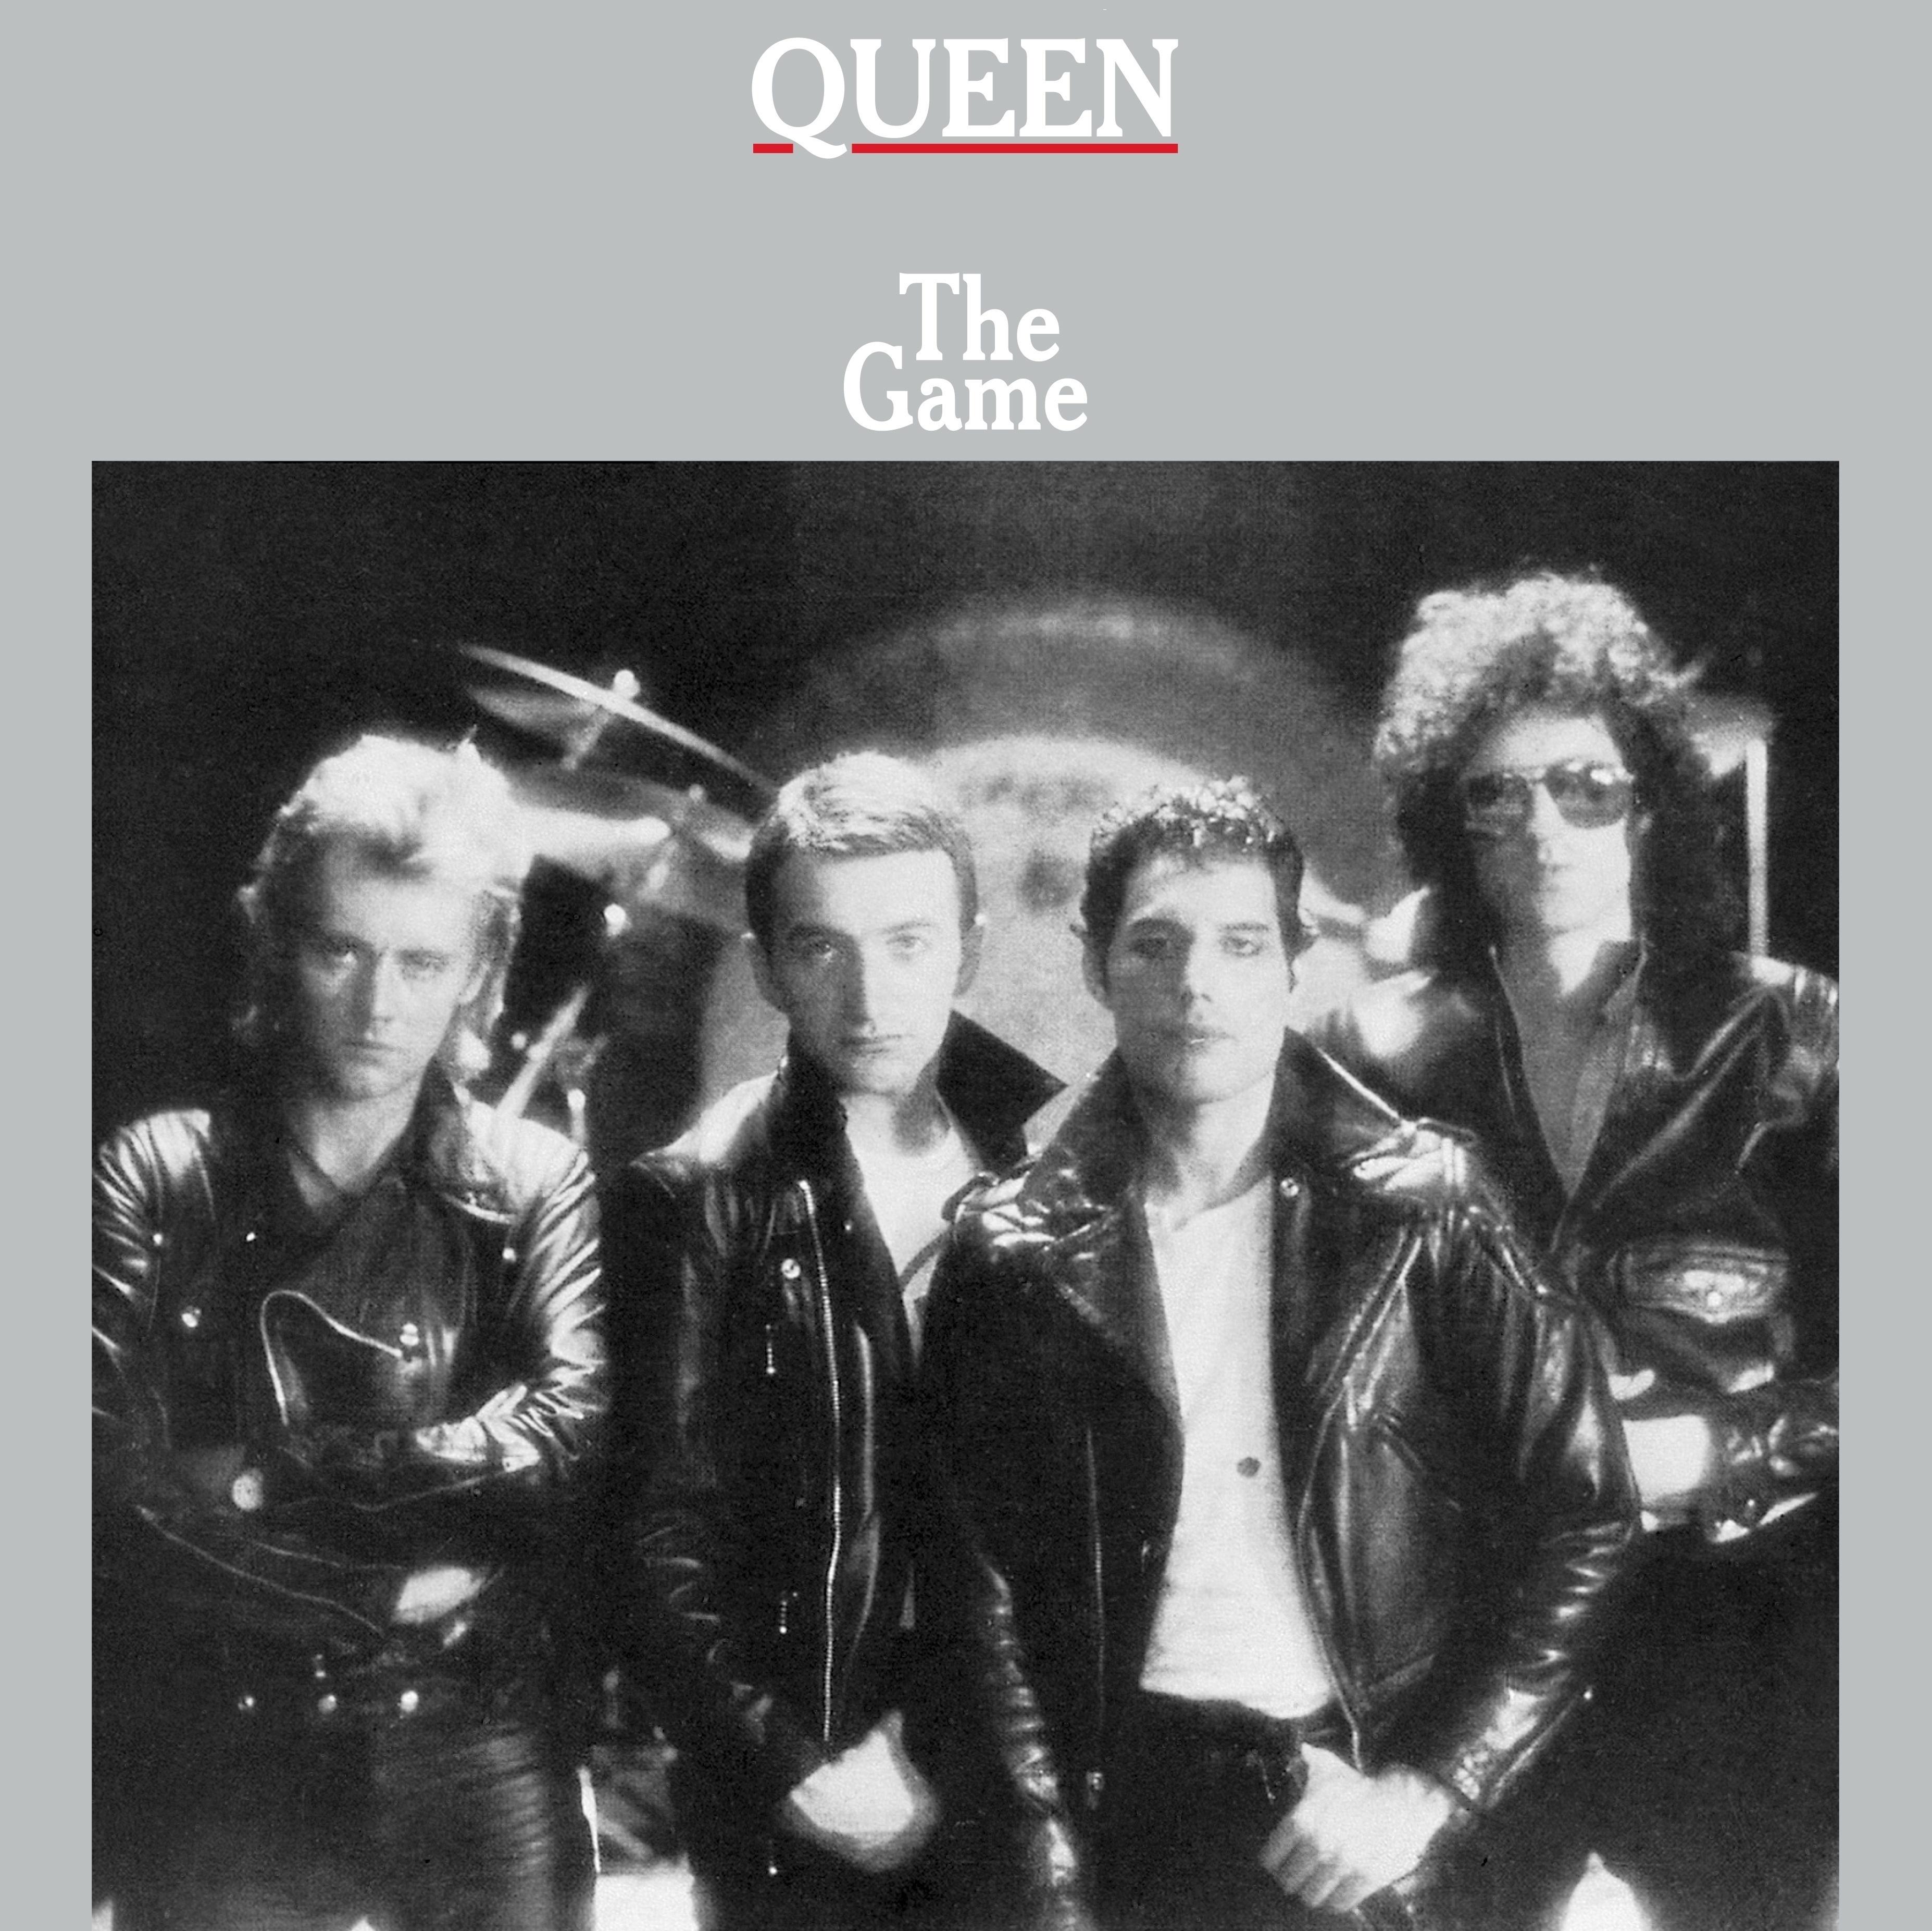 queen_the_game_1980_2.jpg